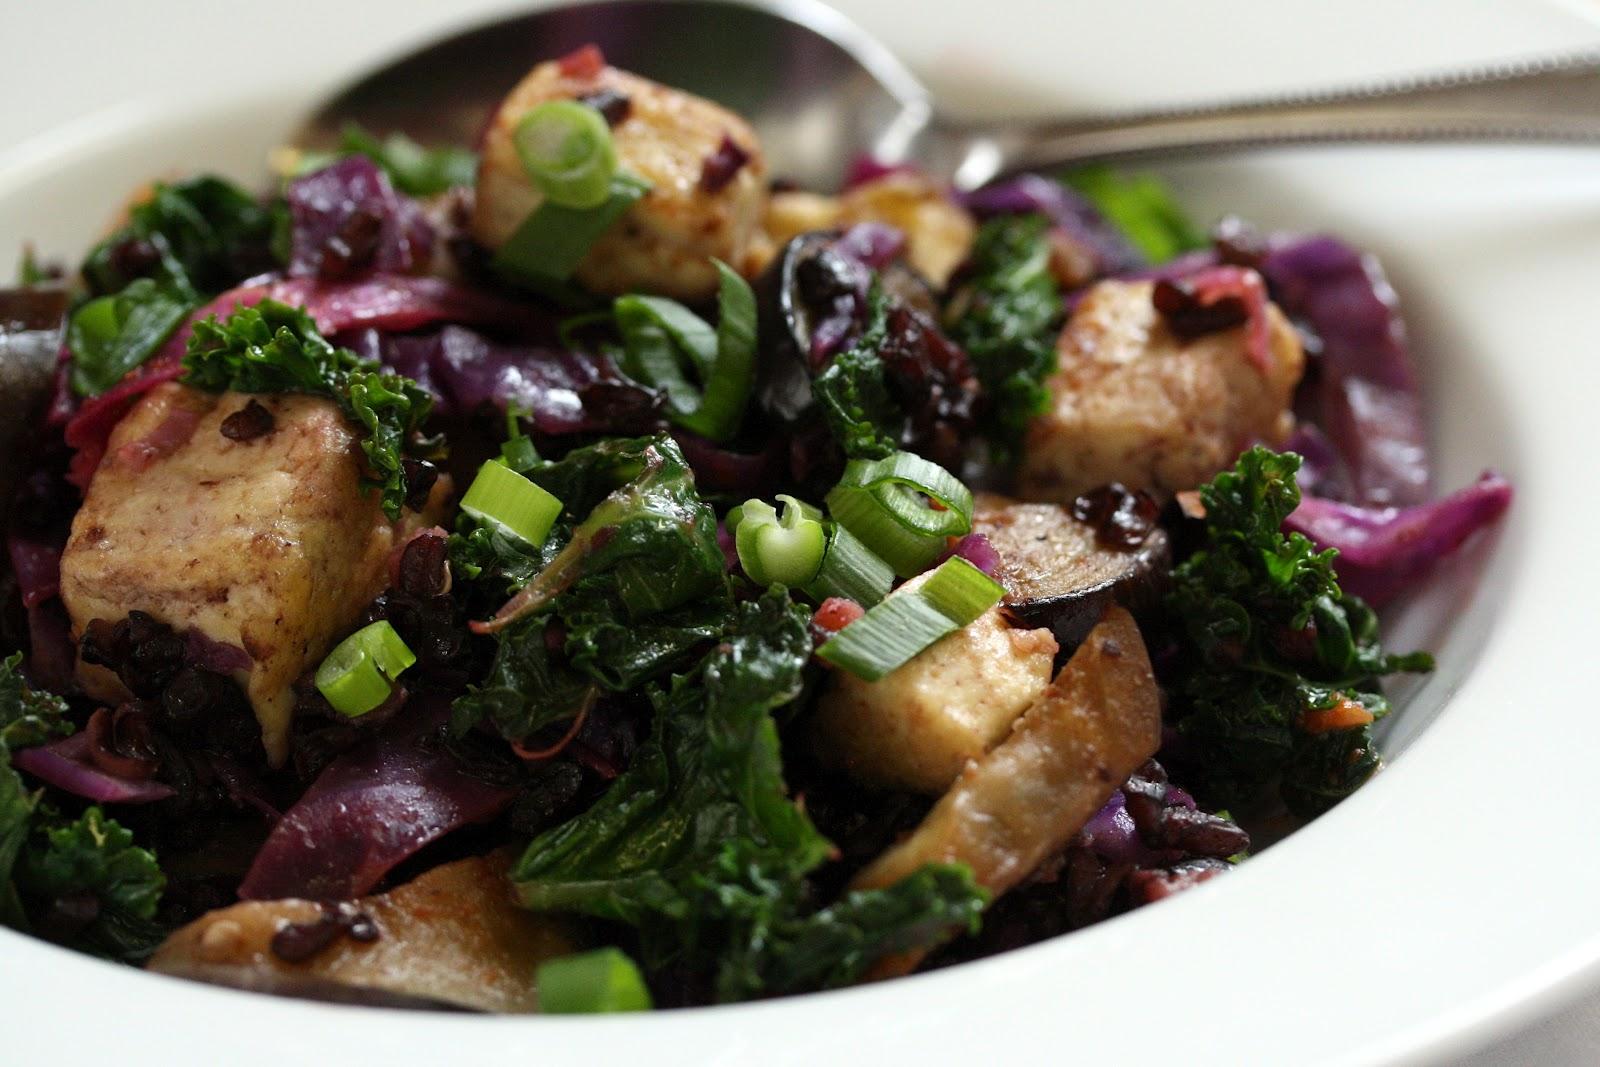 Black Rice Vegetable Stir Fry - Saving Room for Dessert